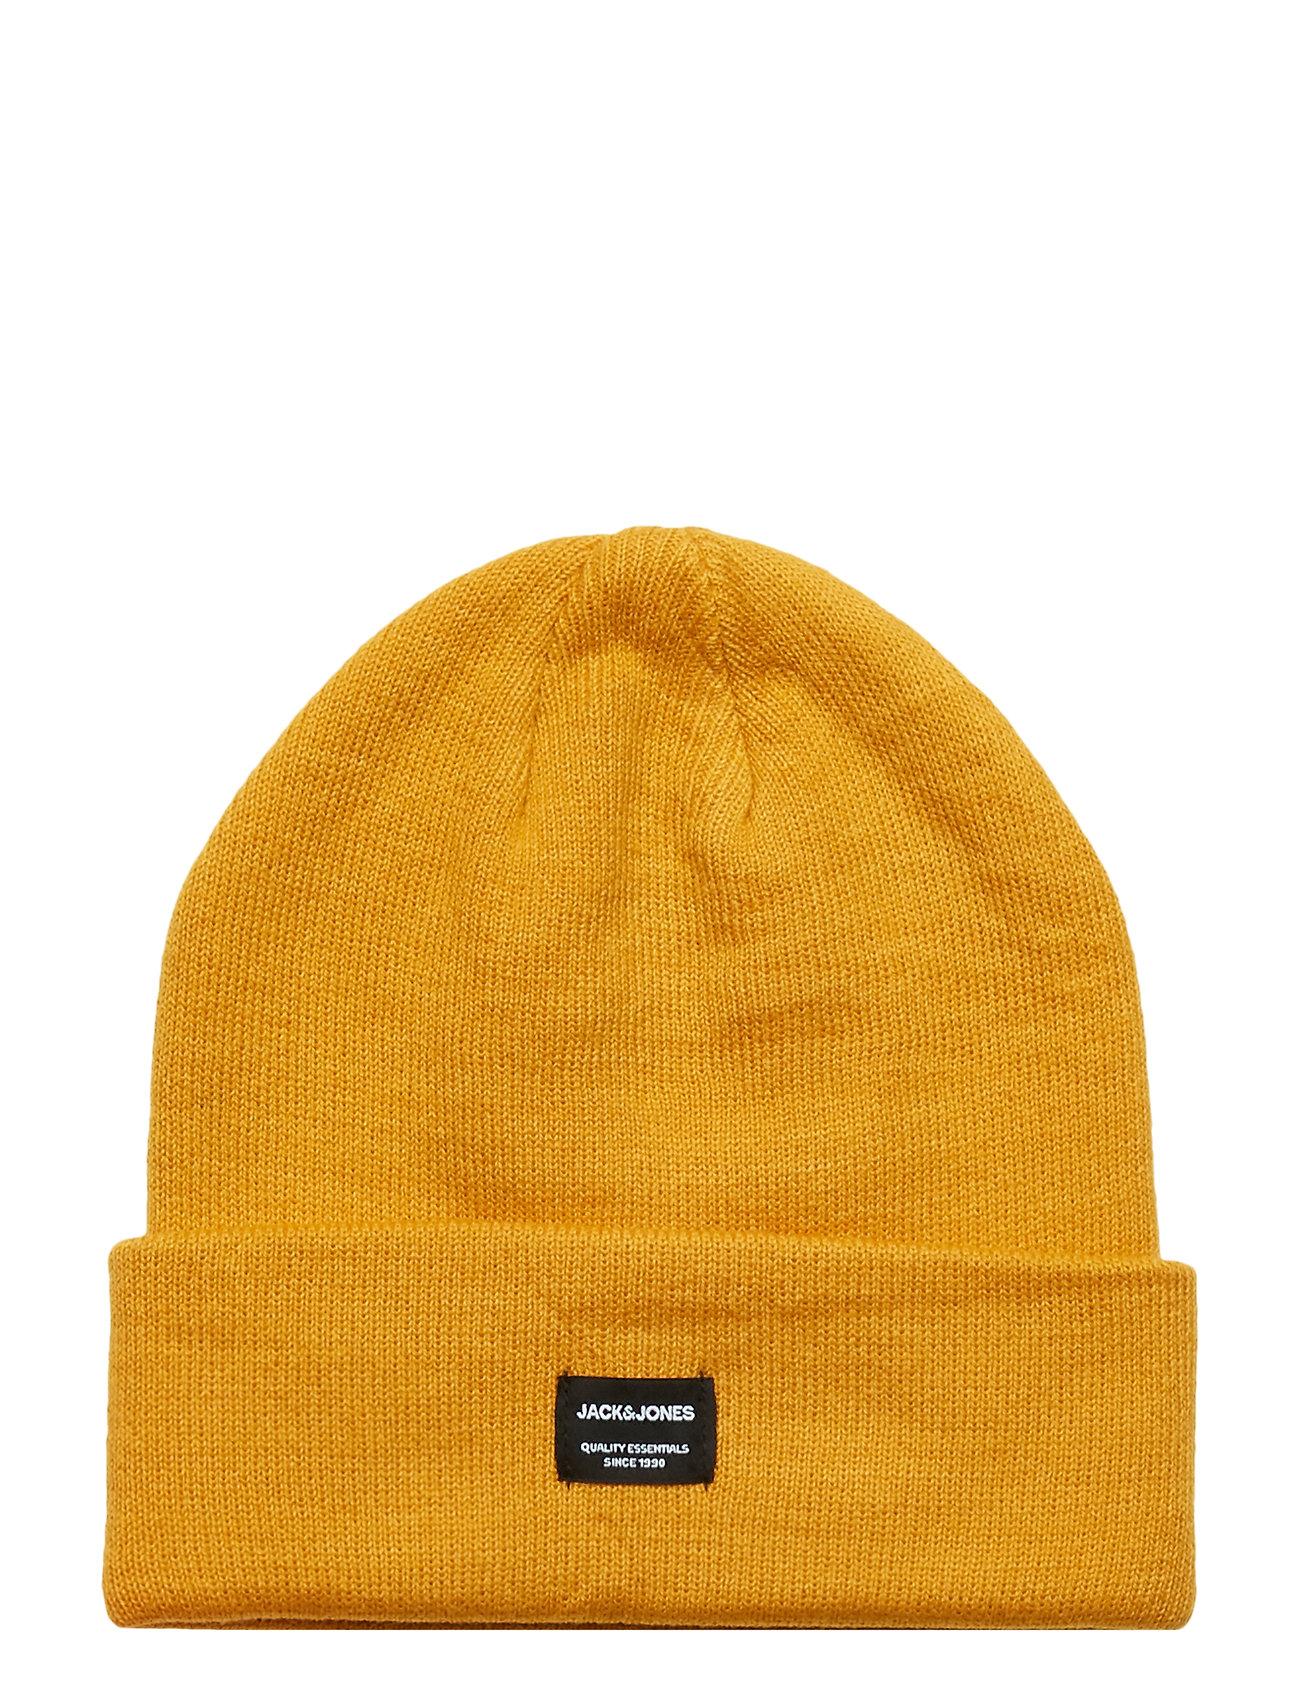 Image of Jacdna Beanie Noos Accessories Hats & Caps Beanies Gul Jack & J S (3213733555)